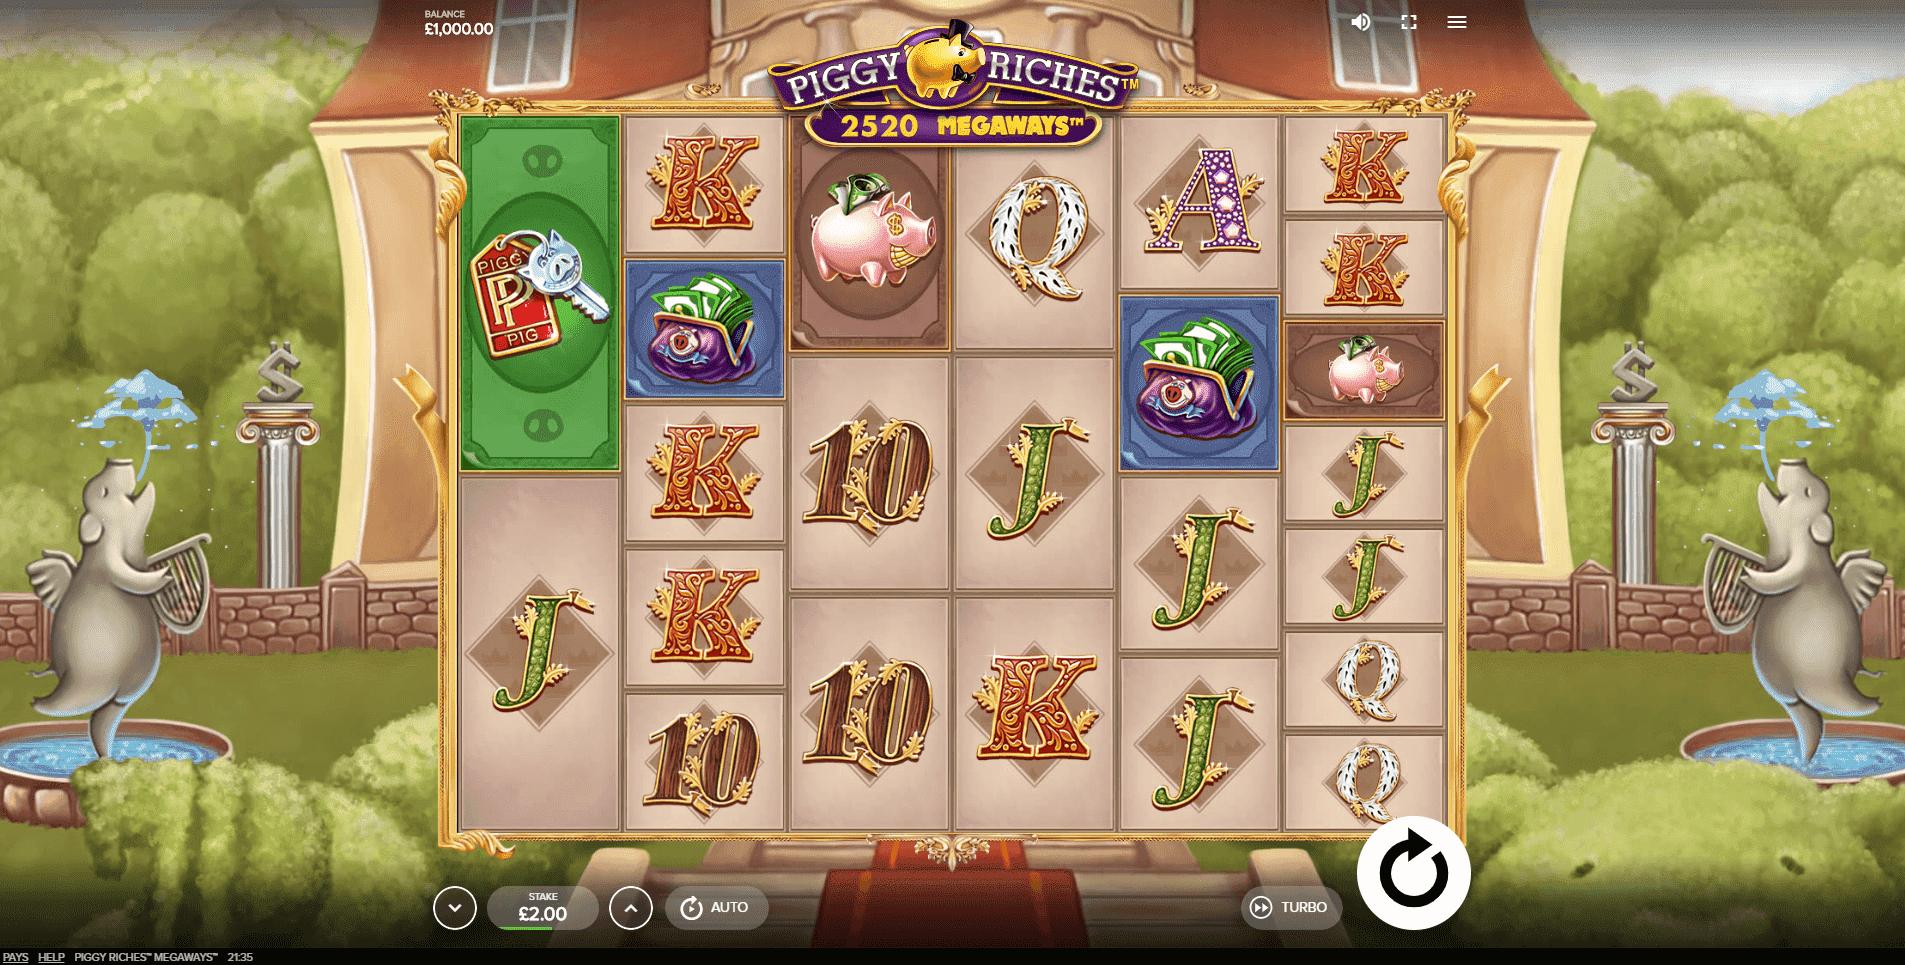 Piggy Riches Megaways slot machine screenshot